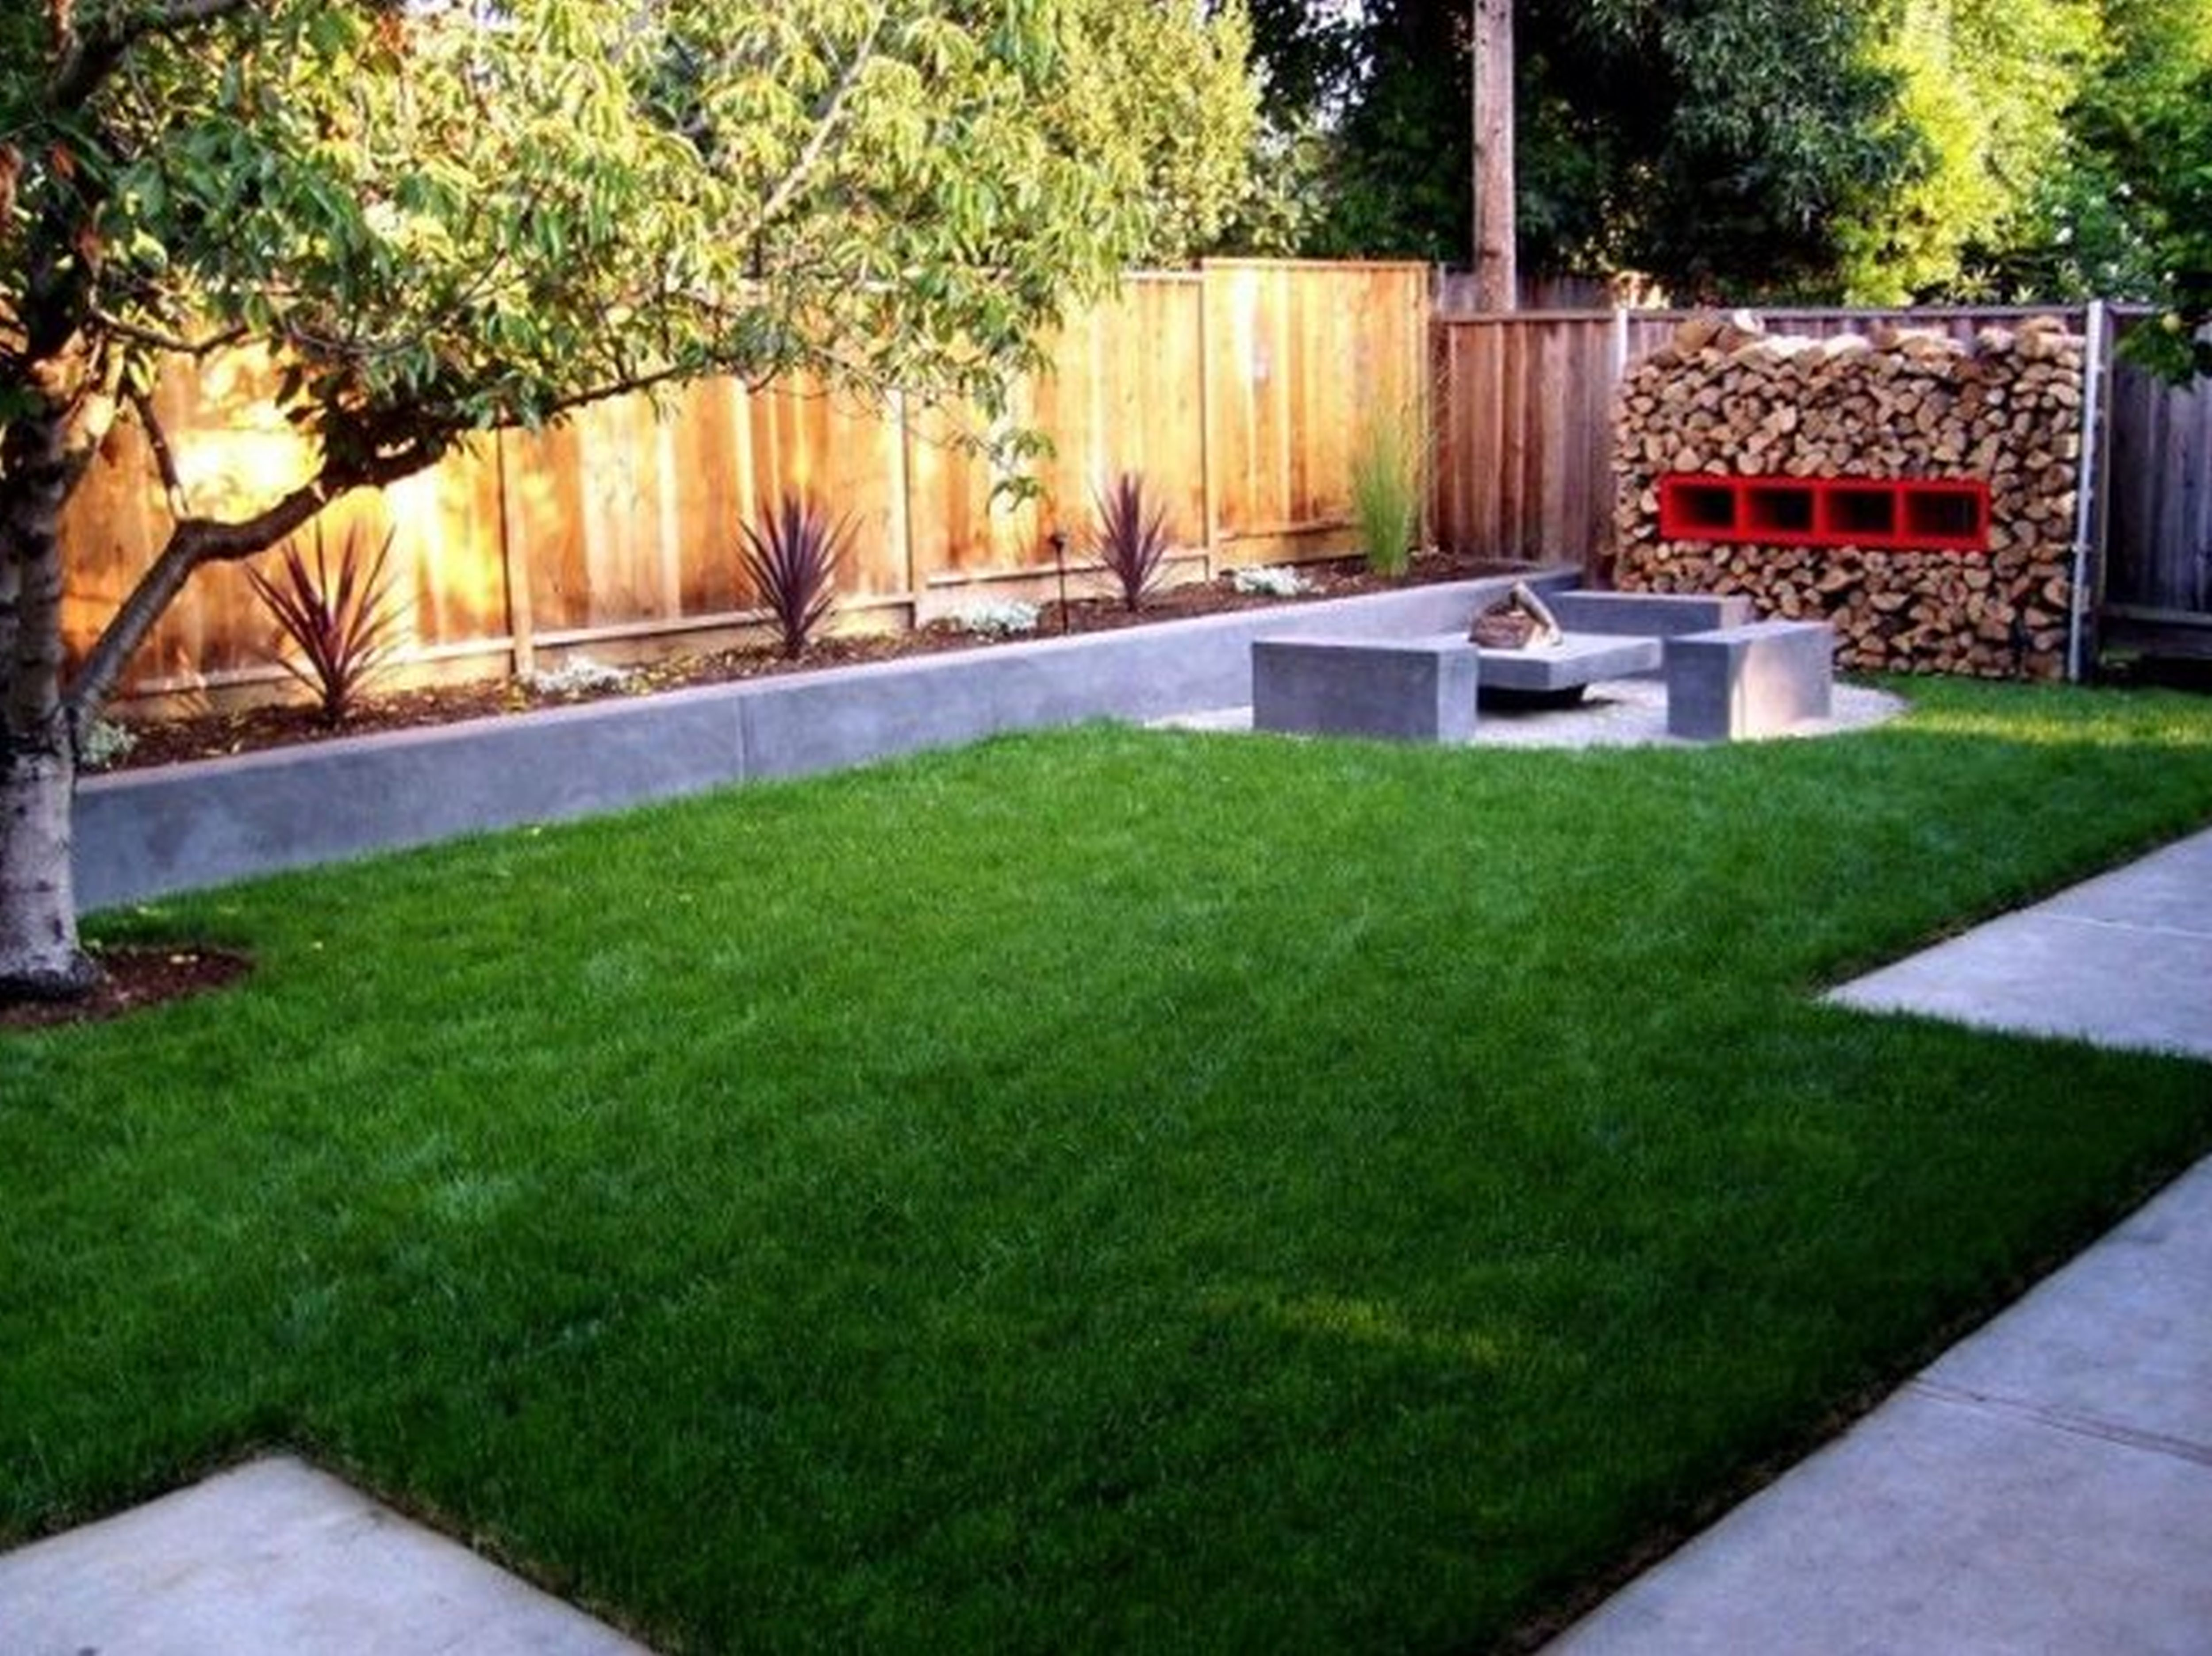 49 Magnificent Backyard Design Ideas To Try For Your Garden Large Backyard Landscaping Backyard Garden Small Backyard Gardens